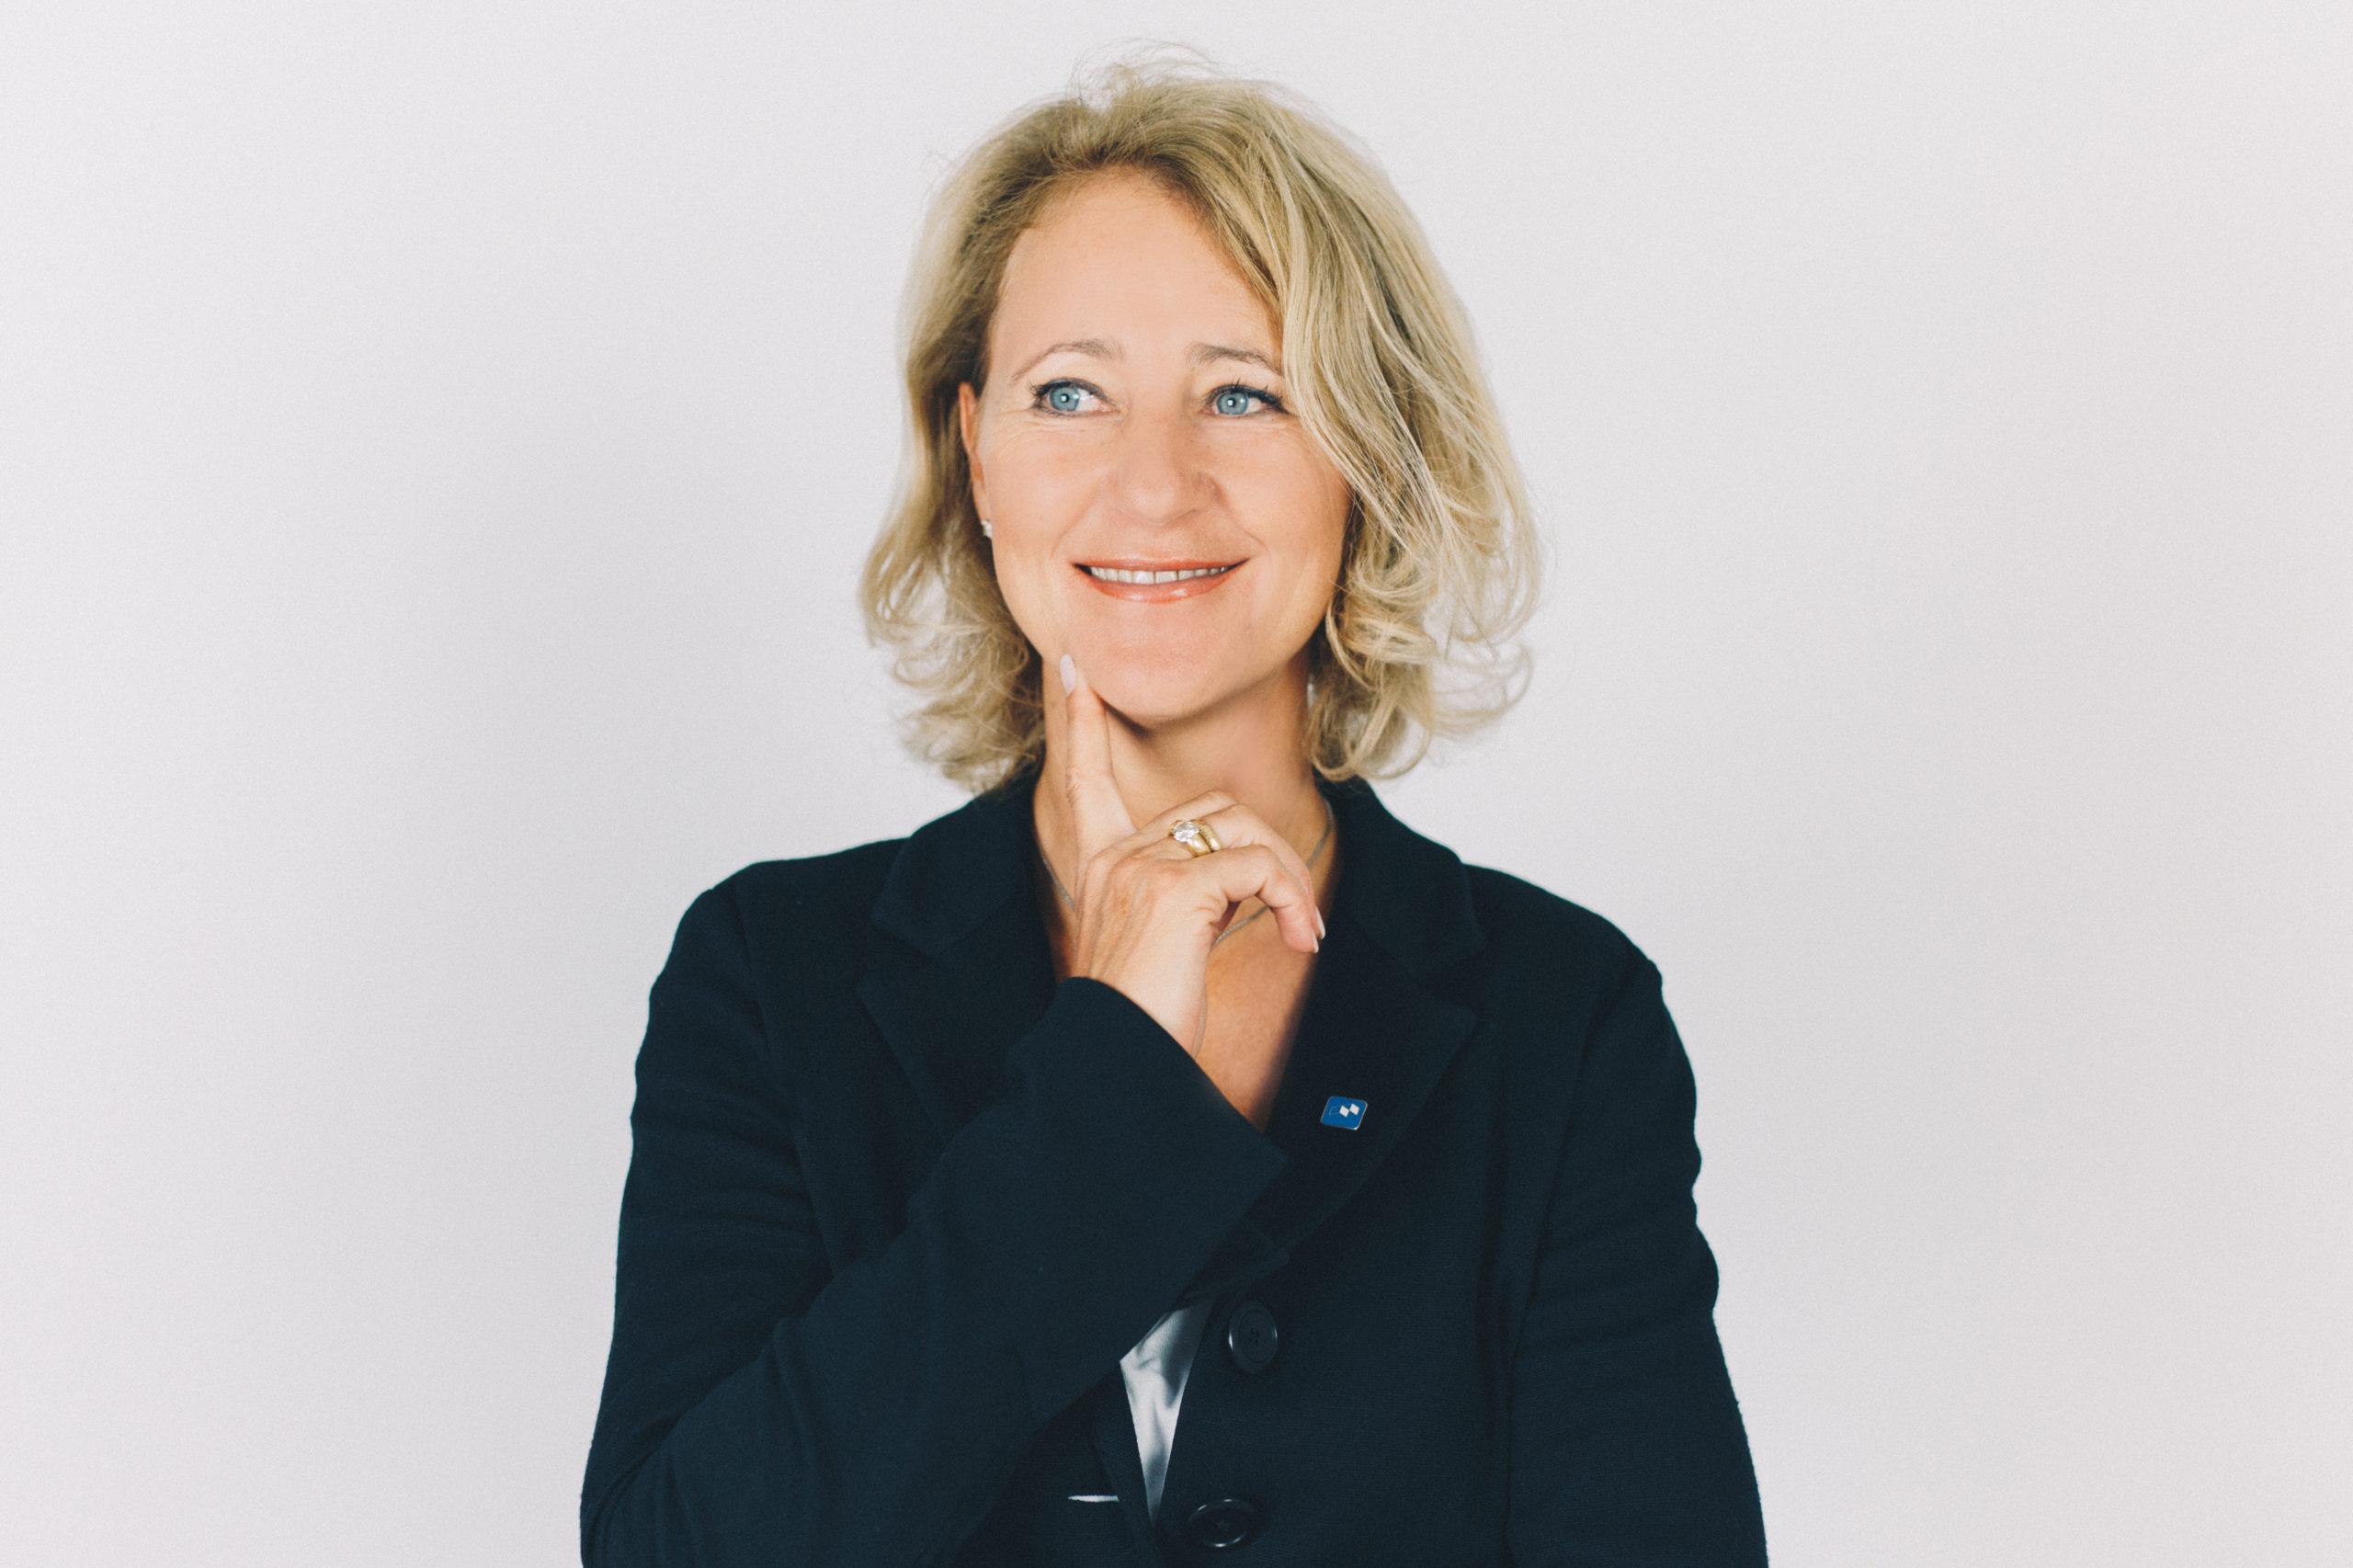 #earlyurbantalk by GIRA - Immobilienfrühstück - Zu Gast: Dipl.-Kfr. Nina Strubl, Geschäftsführerin Bayernhaus Immobilien Management GmbH